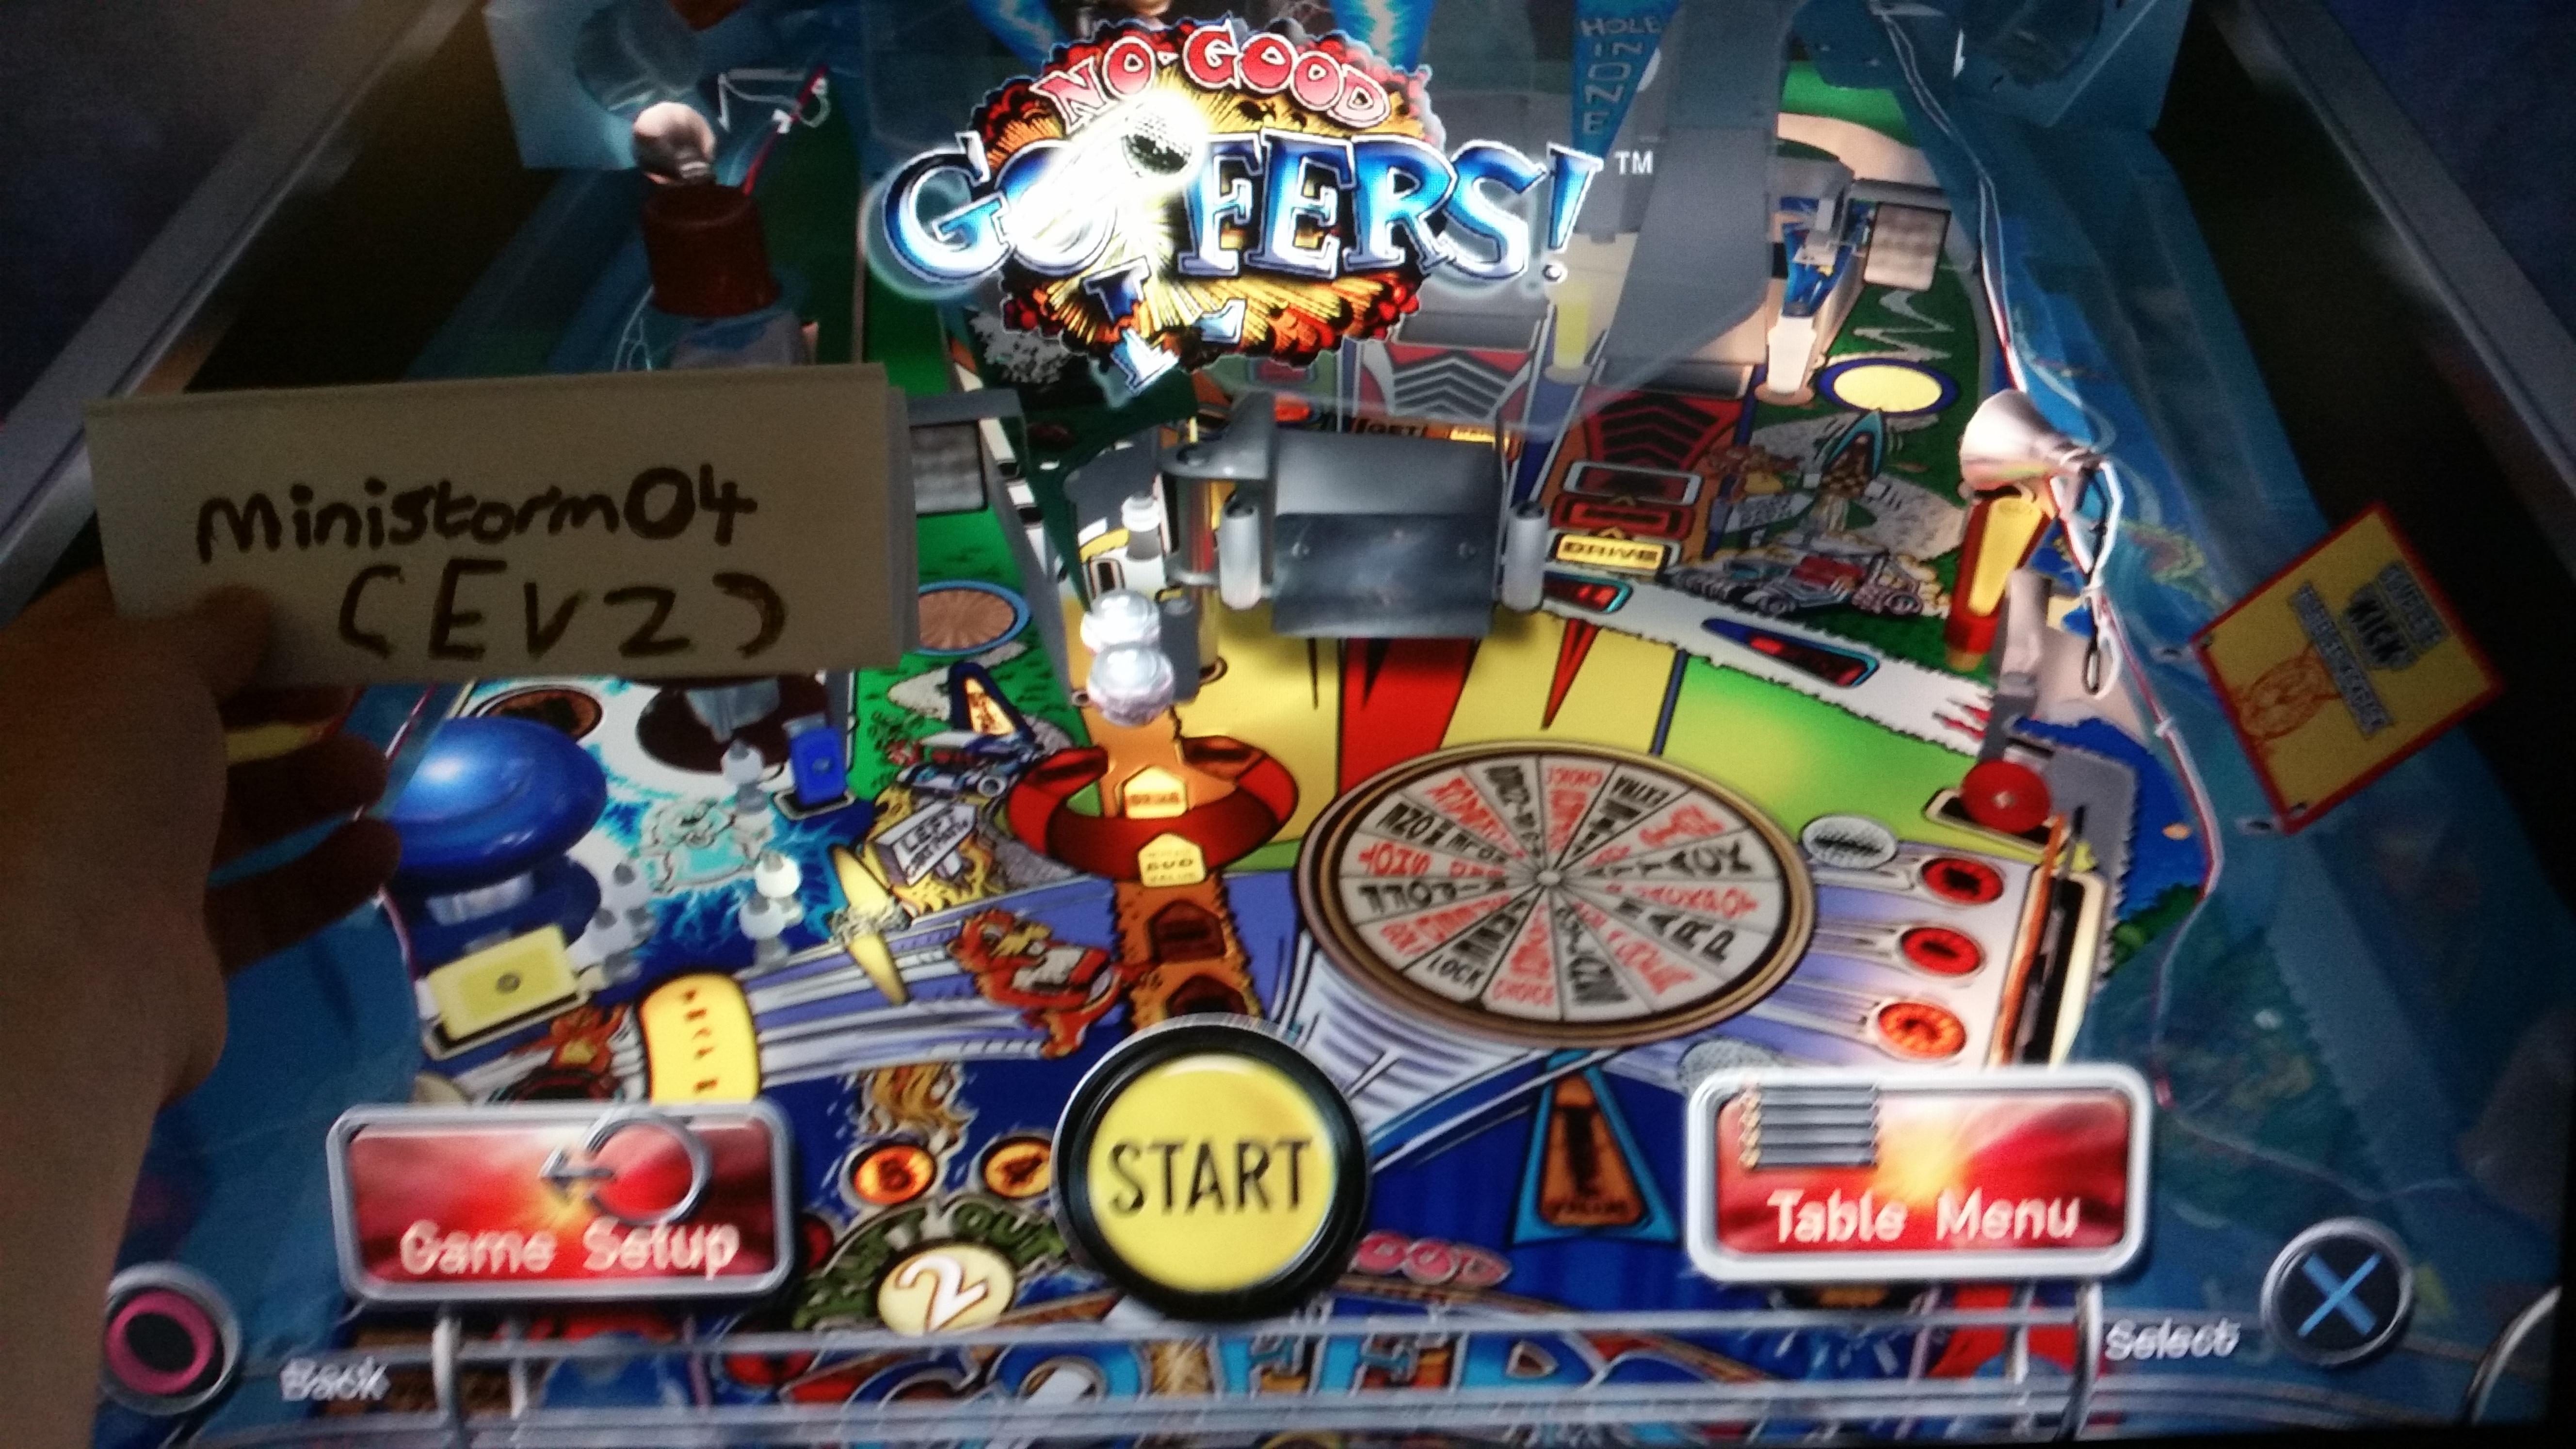 Pinball Arcade: No Good Goofers 21,133,080 points